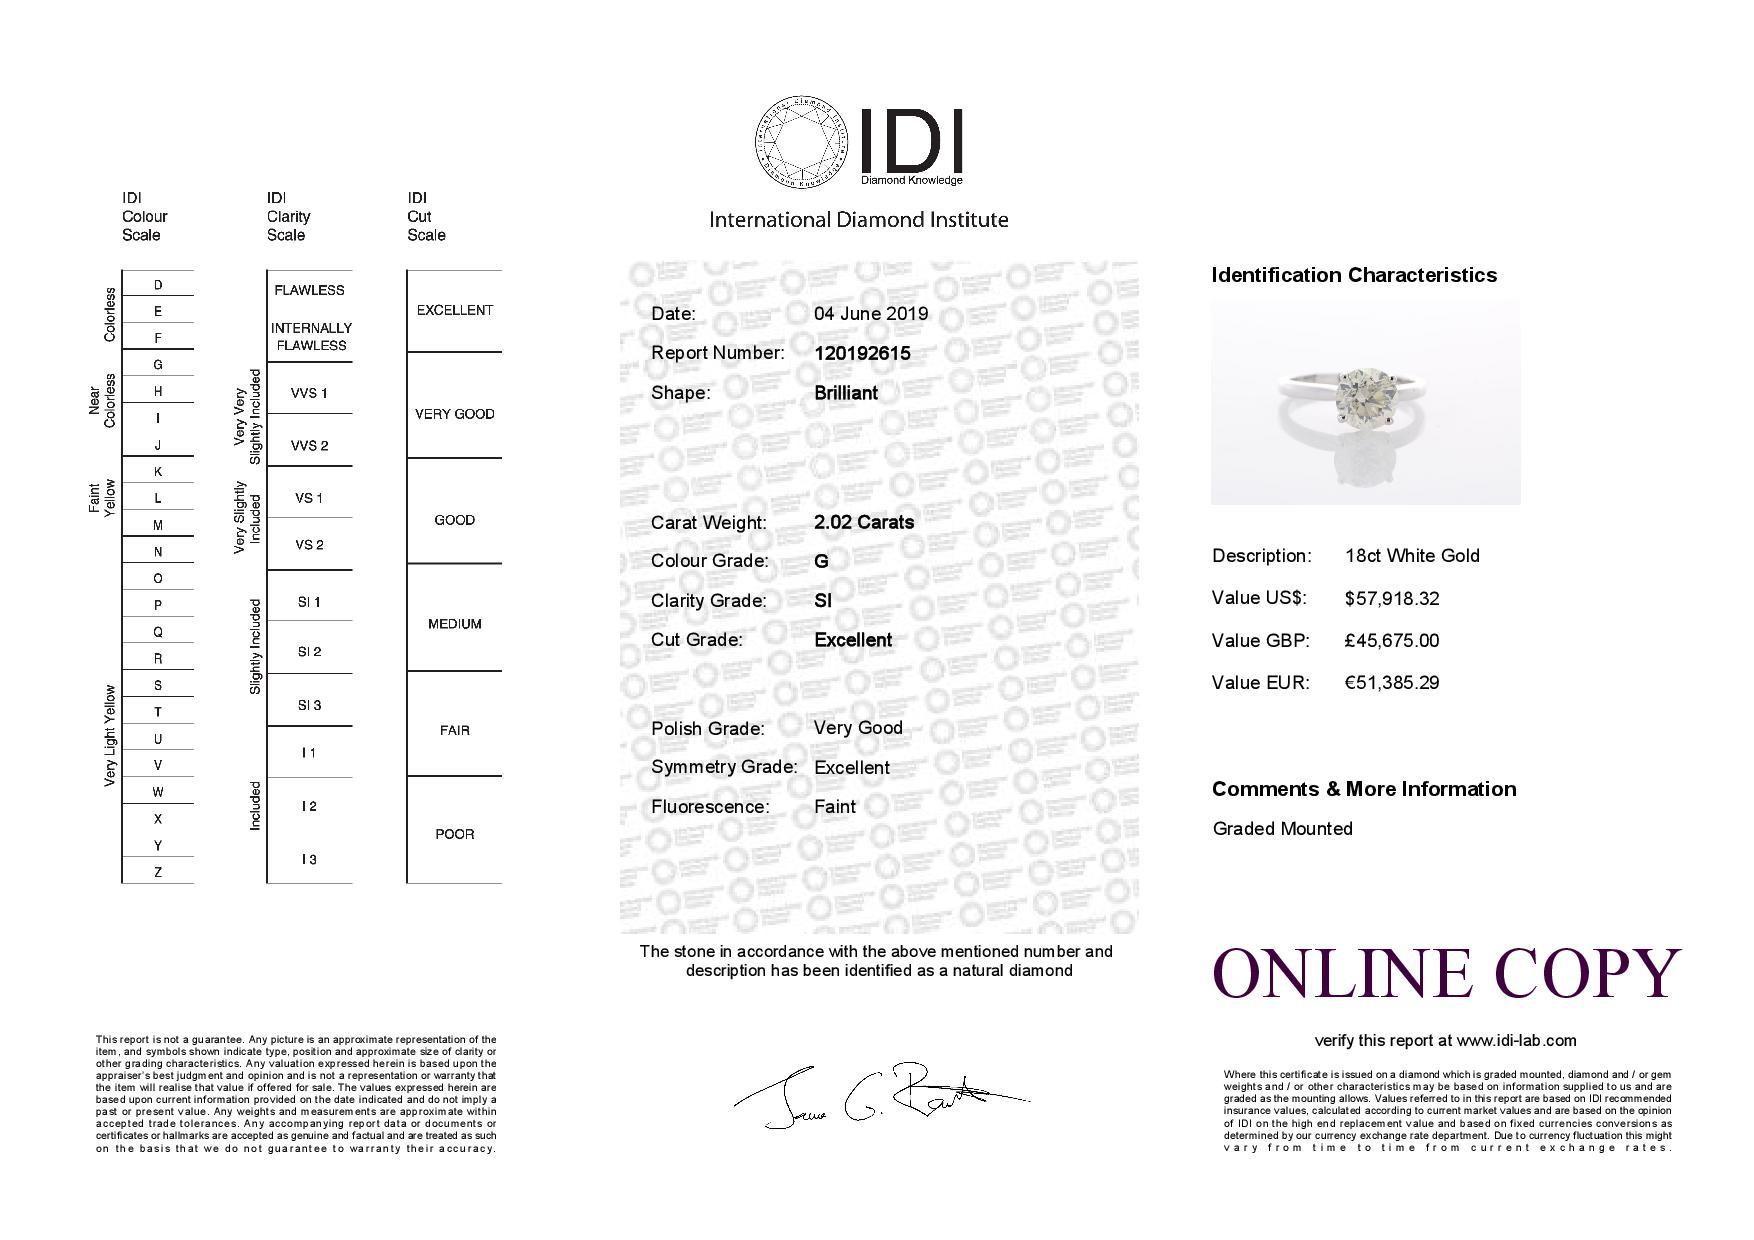 18ct White Gold Single Stone Prong Set Diamond Ring 2.02 Carats - Image 5 of 5